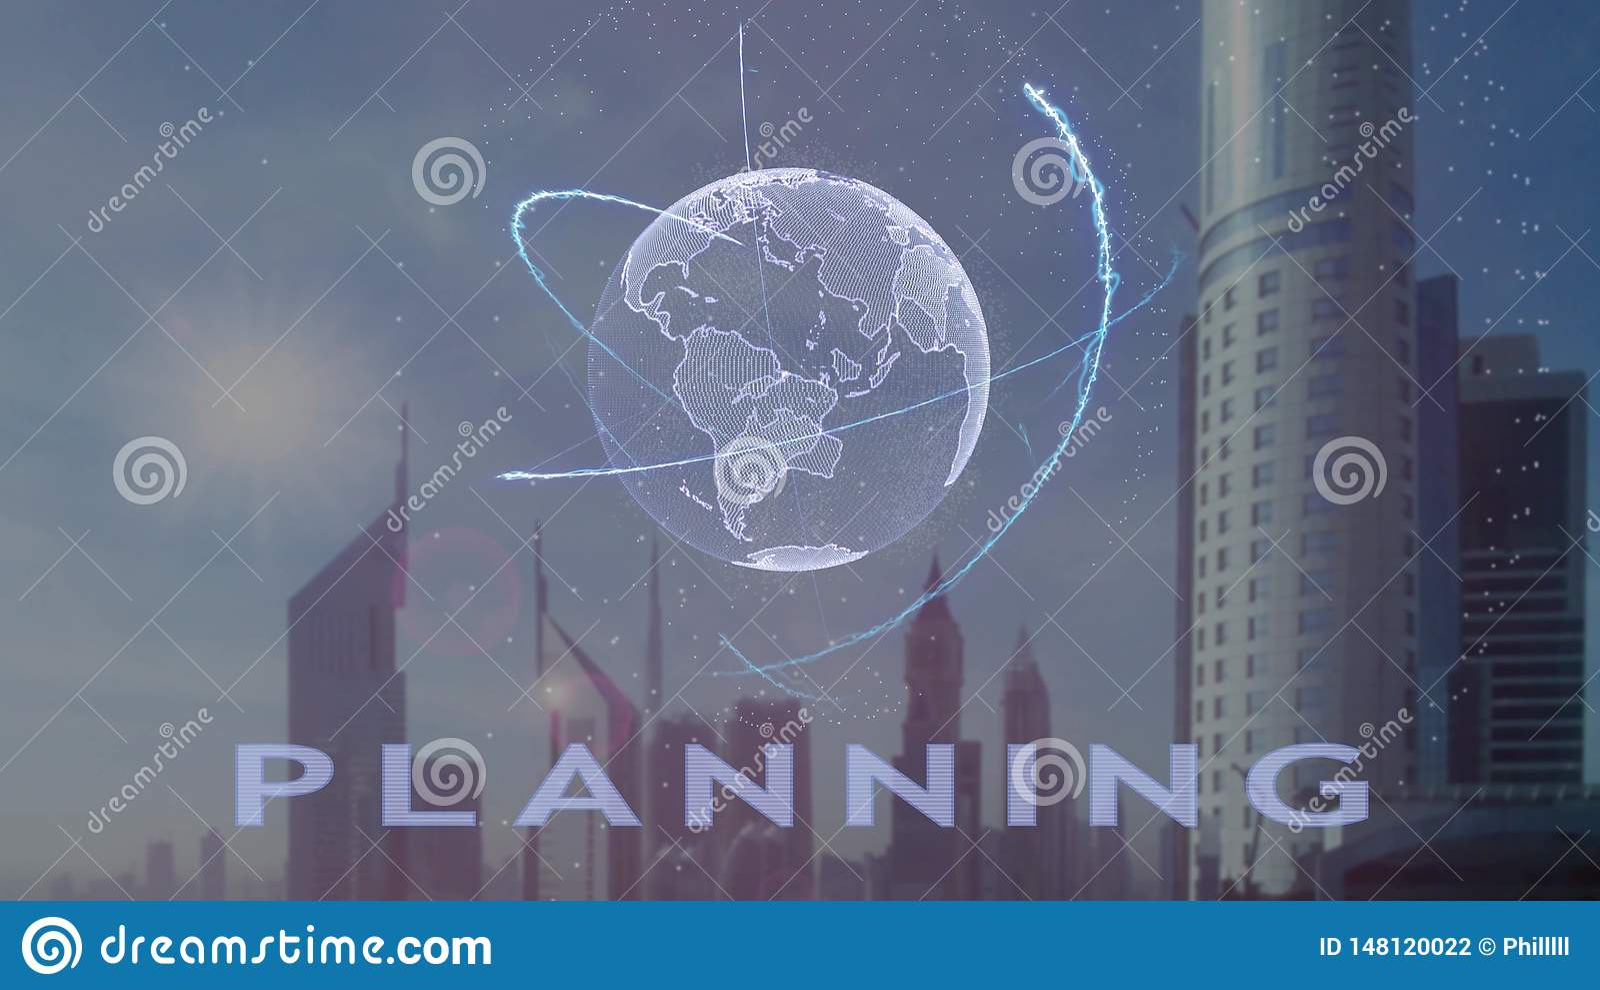 Texto planejando com holograma 3d da terra do planeta contra o contexto da metr?pole moderna